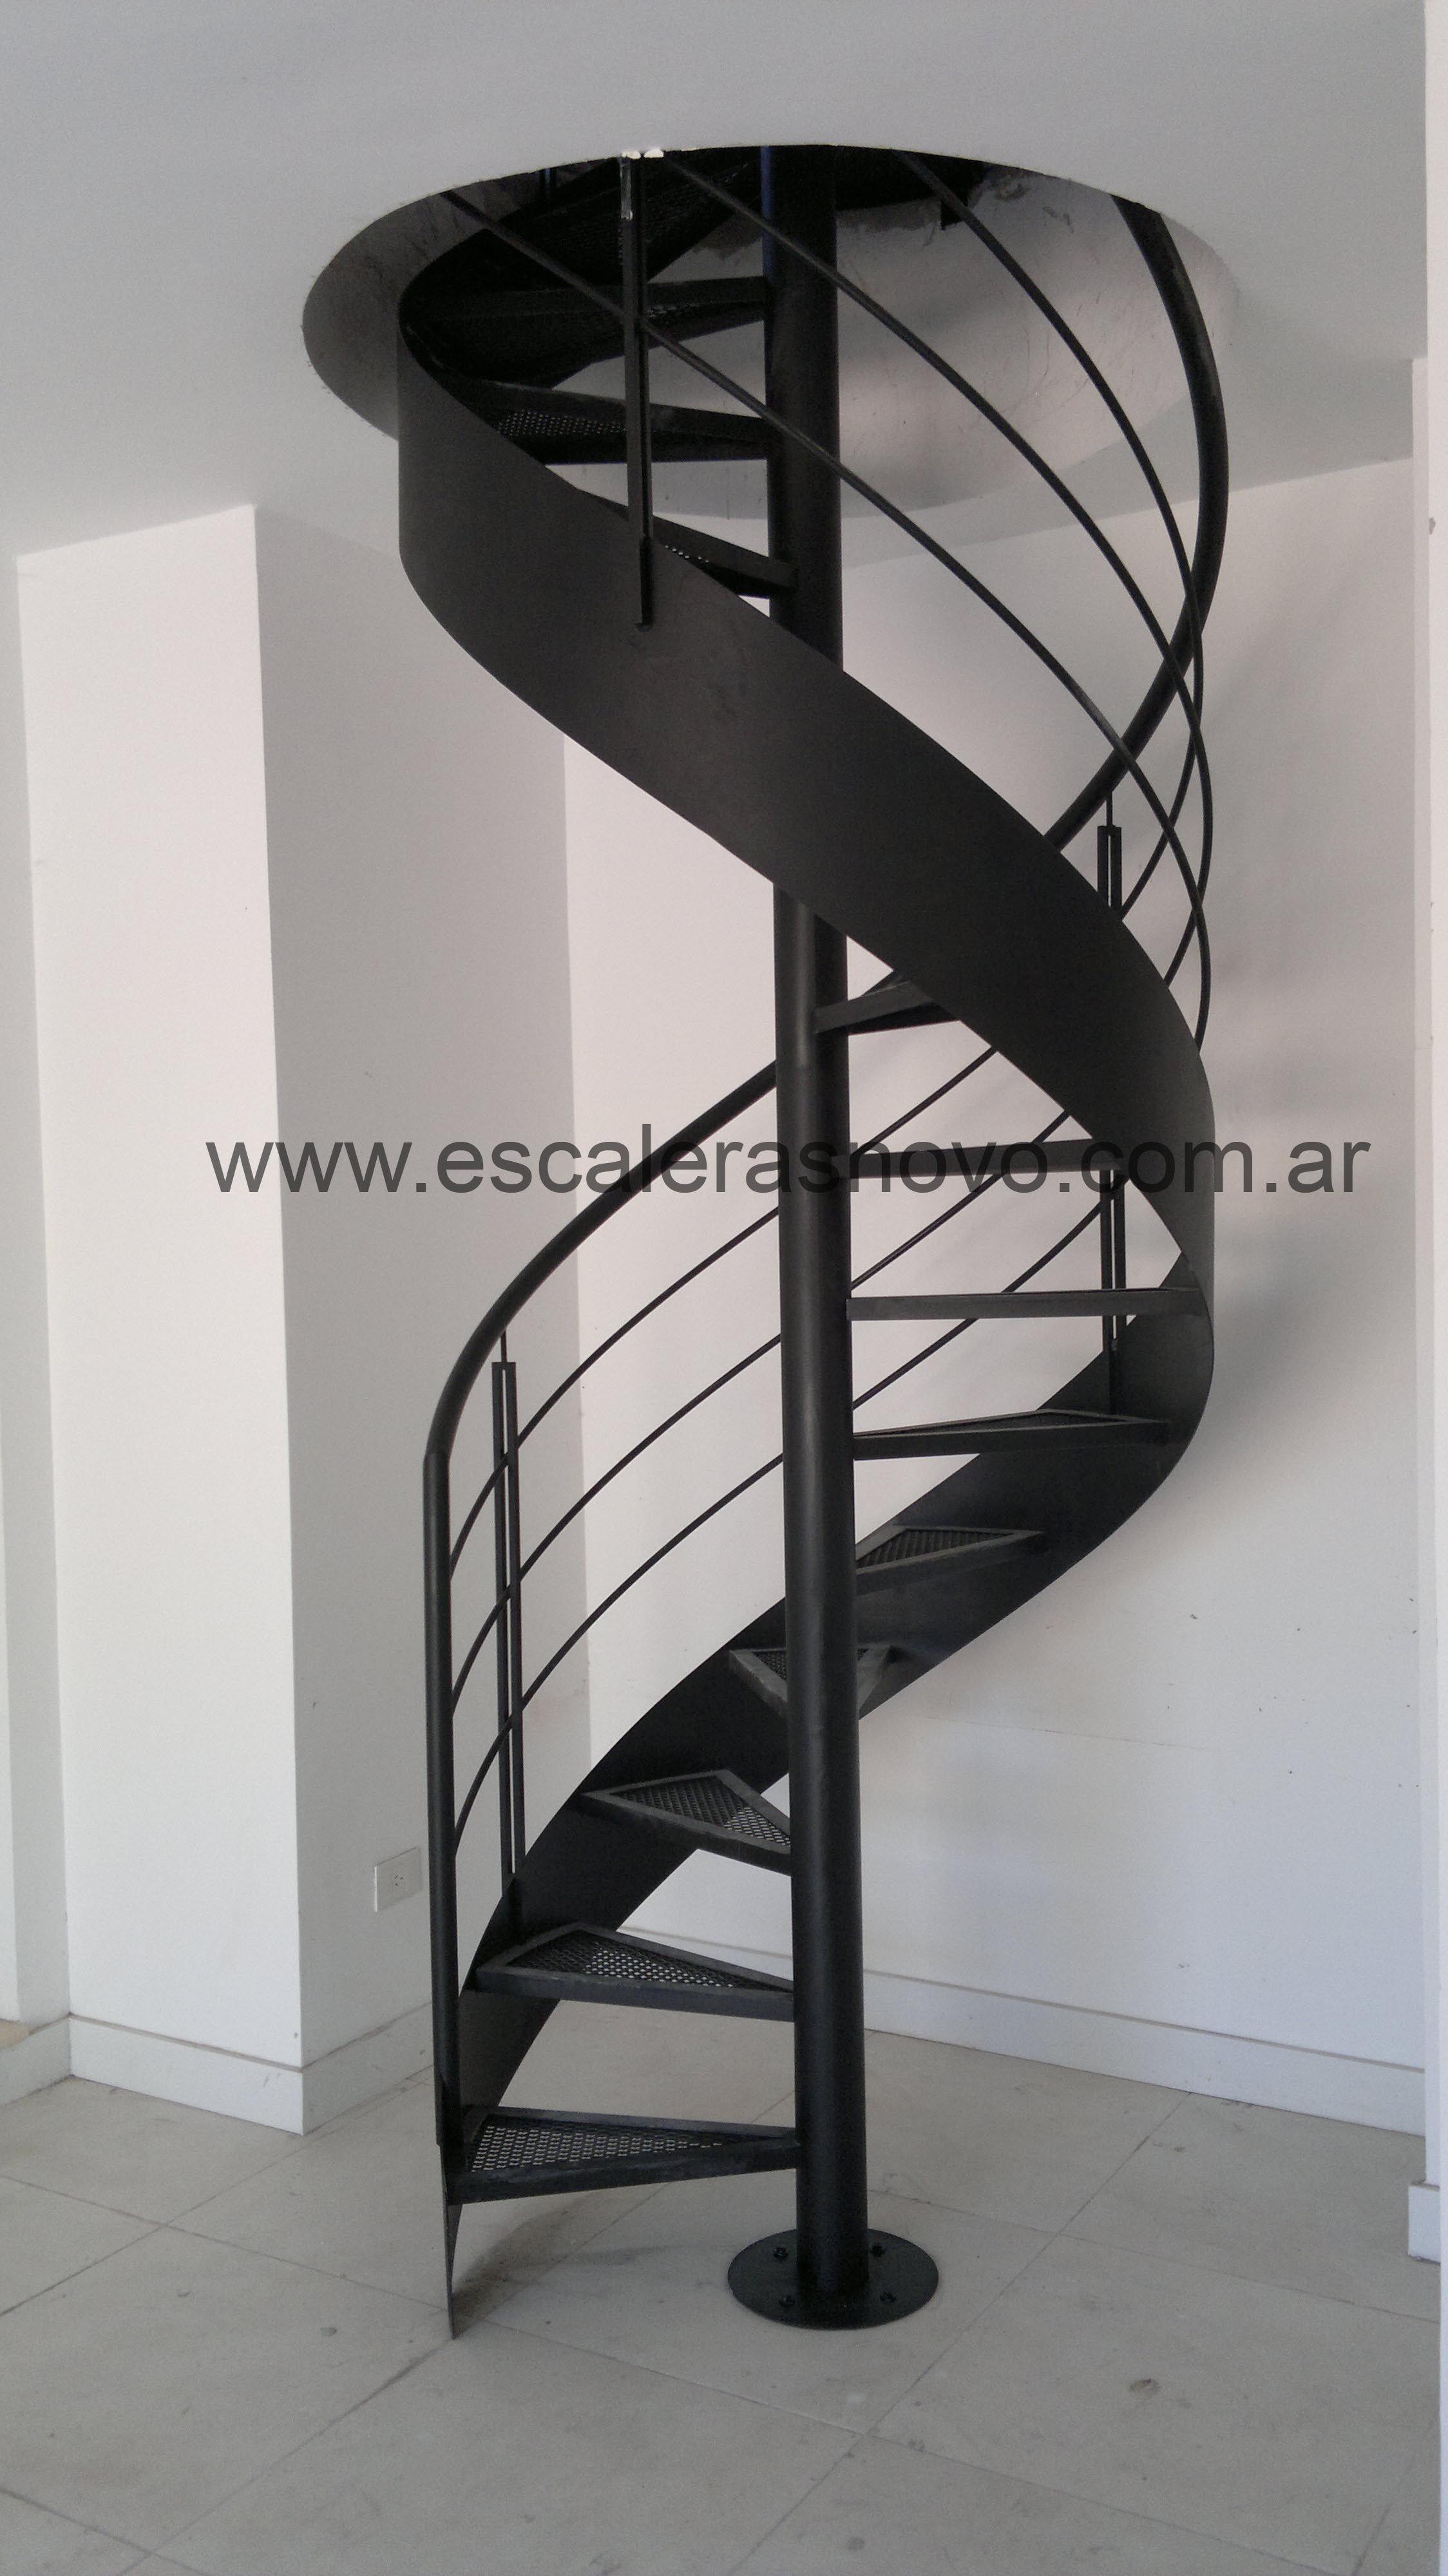 Escalera Caracol Con Cinta N 24 Escaleras Pinterest Escalera